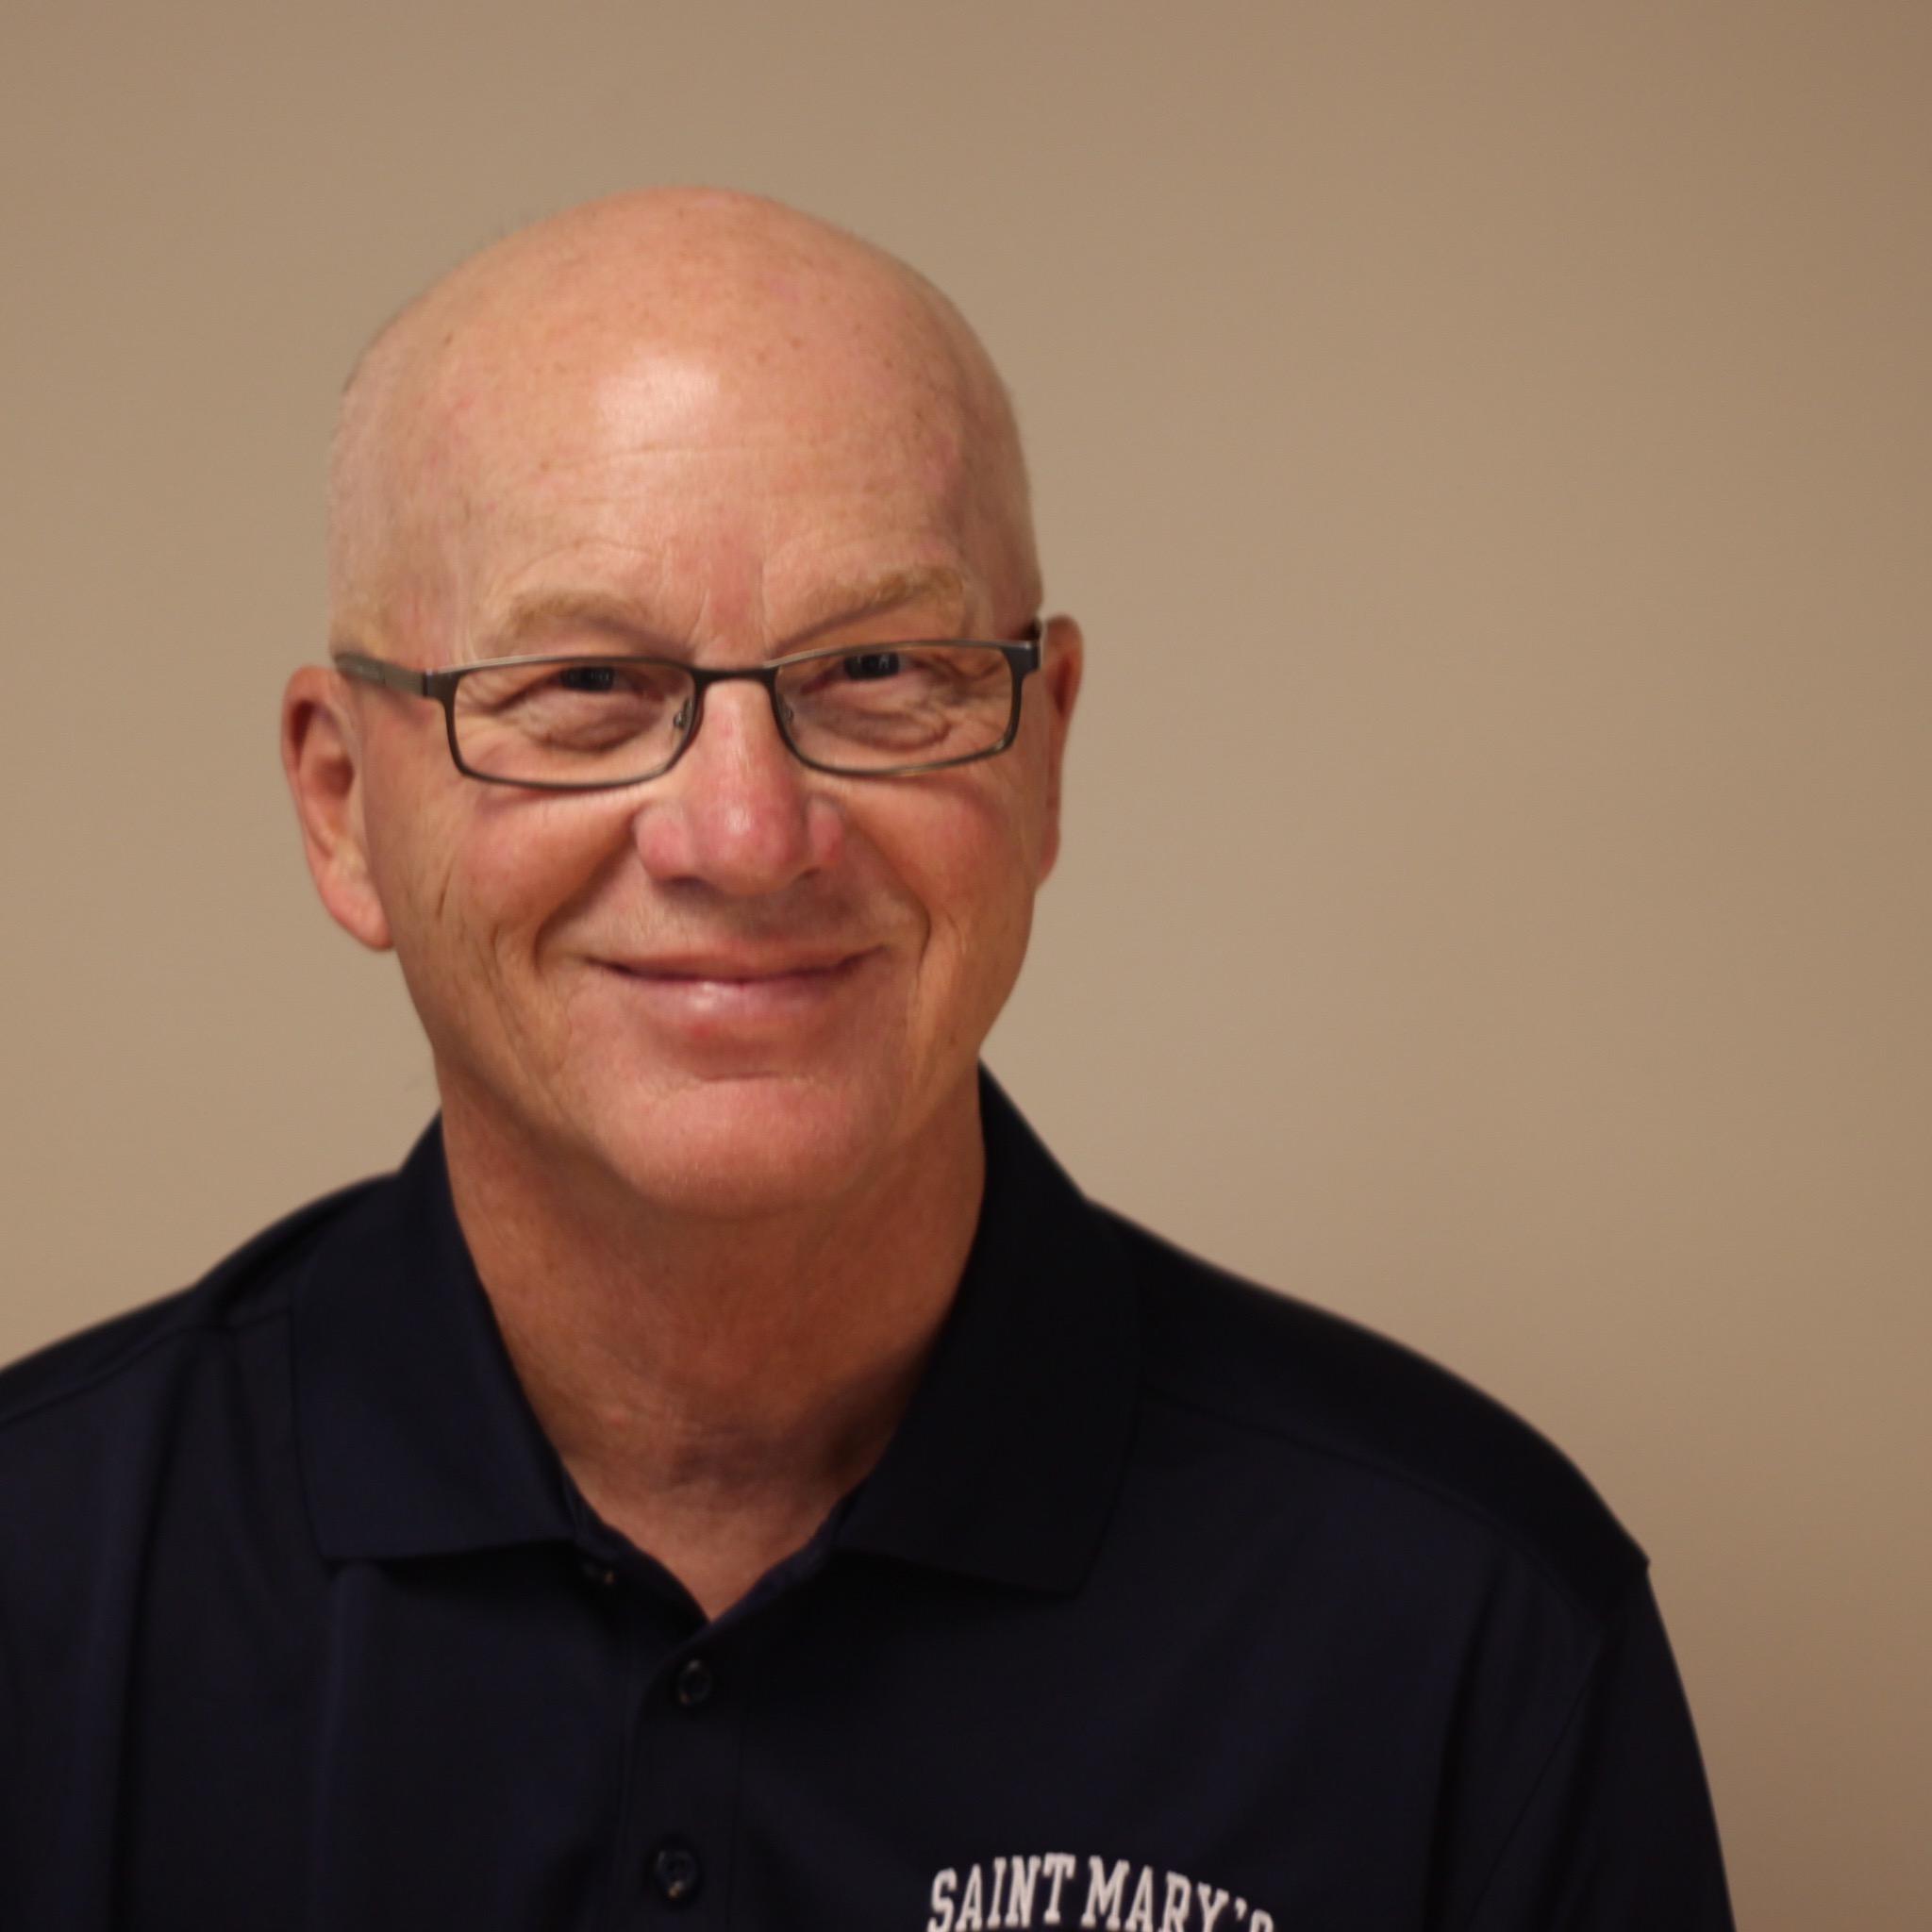 Michael Ecker - Team Leader